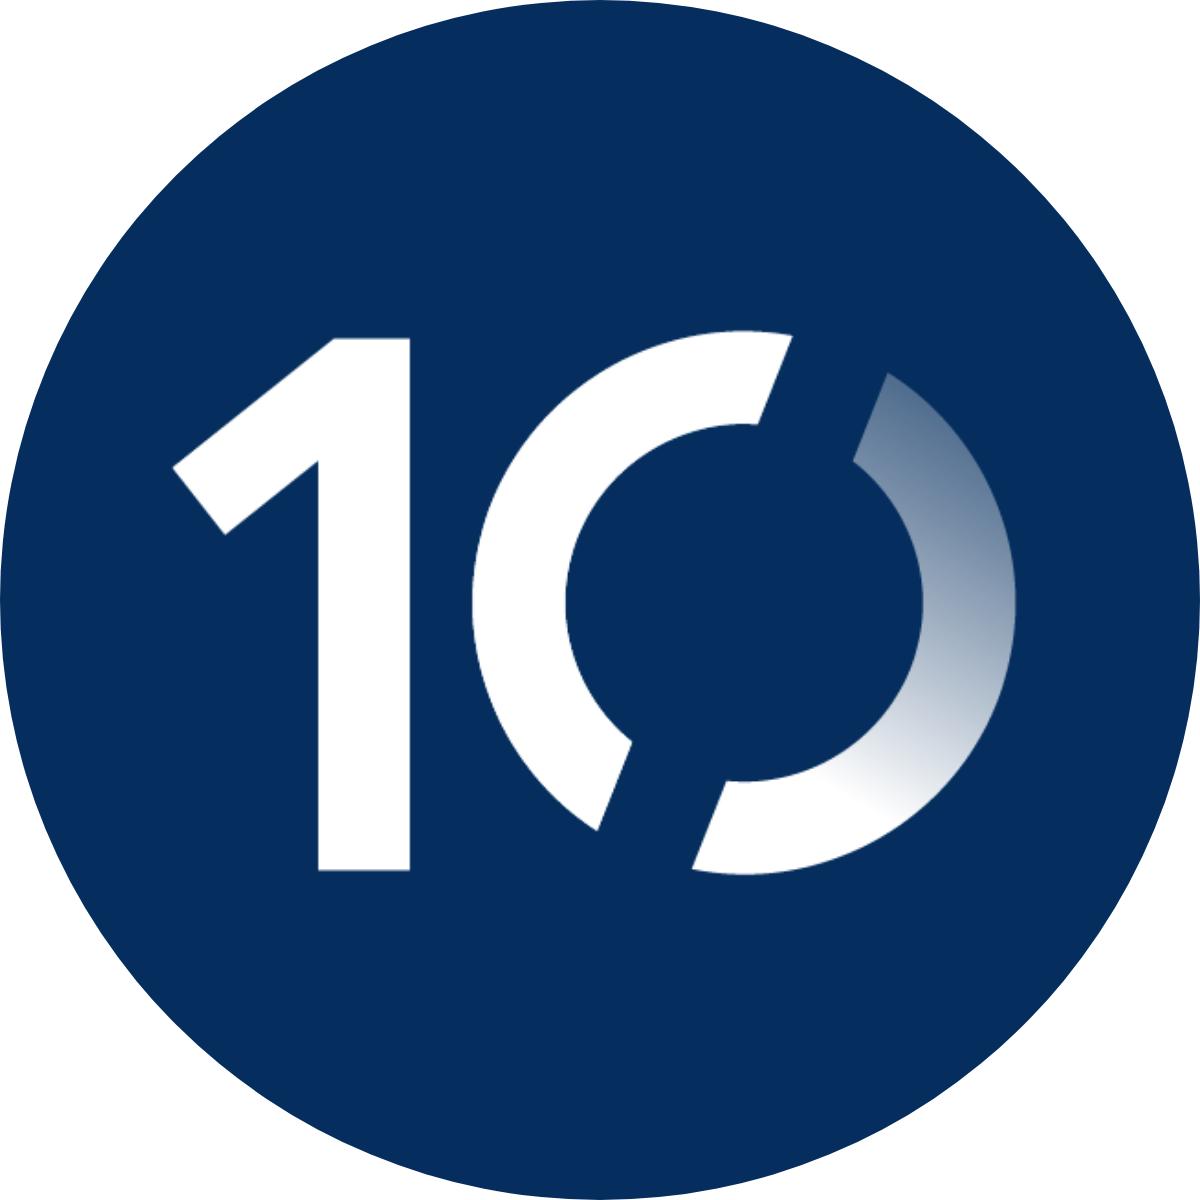 Weekly10 logo